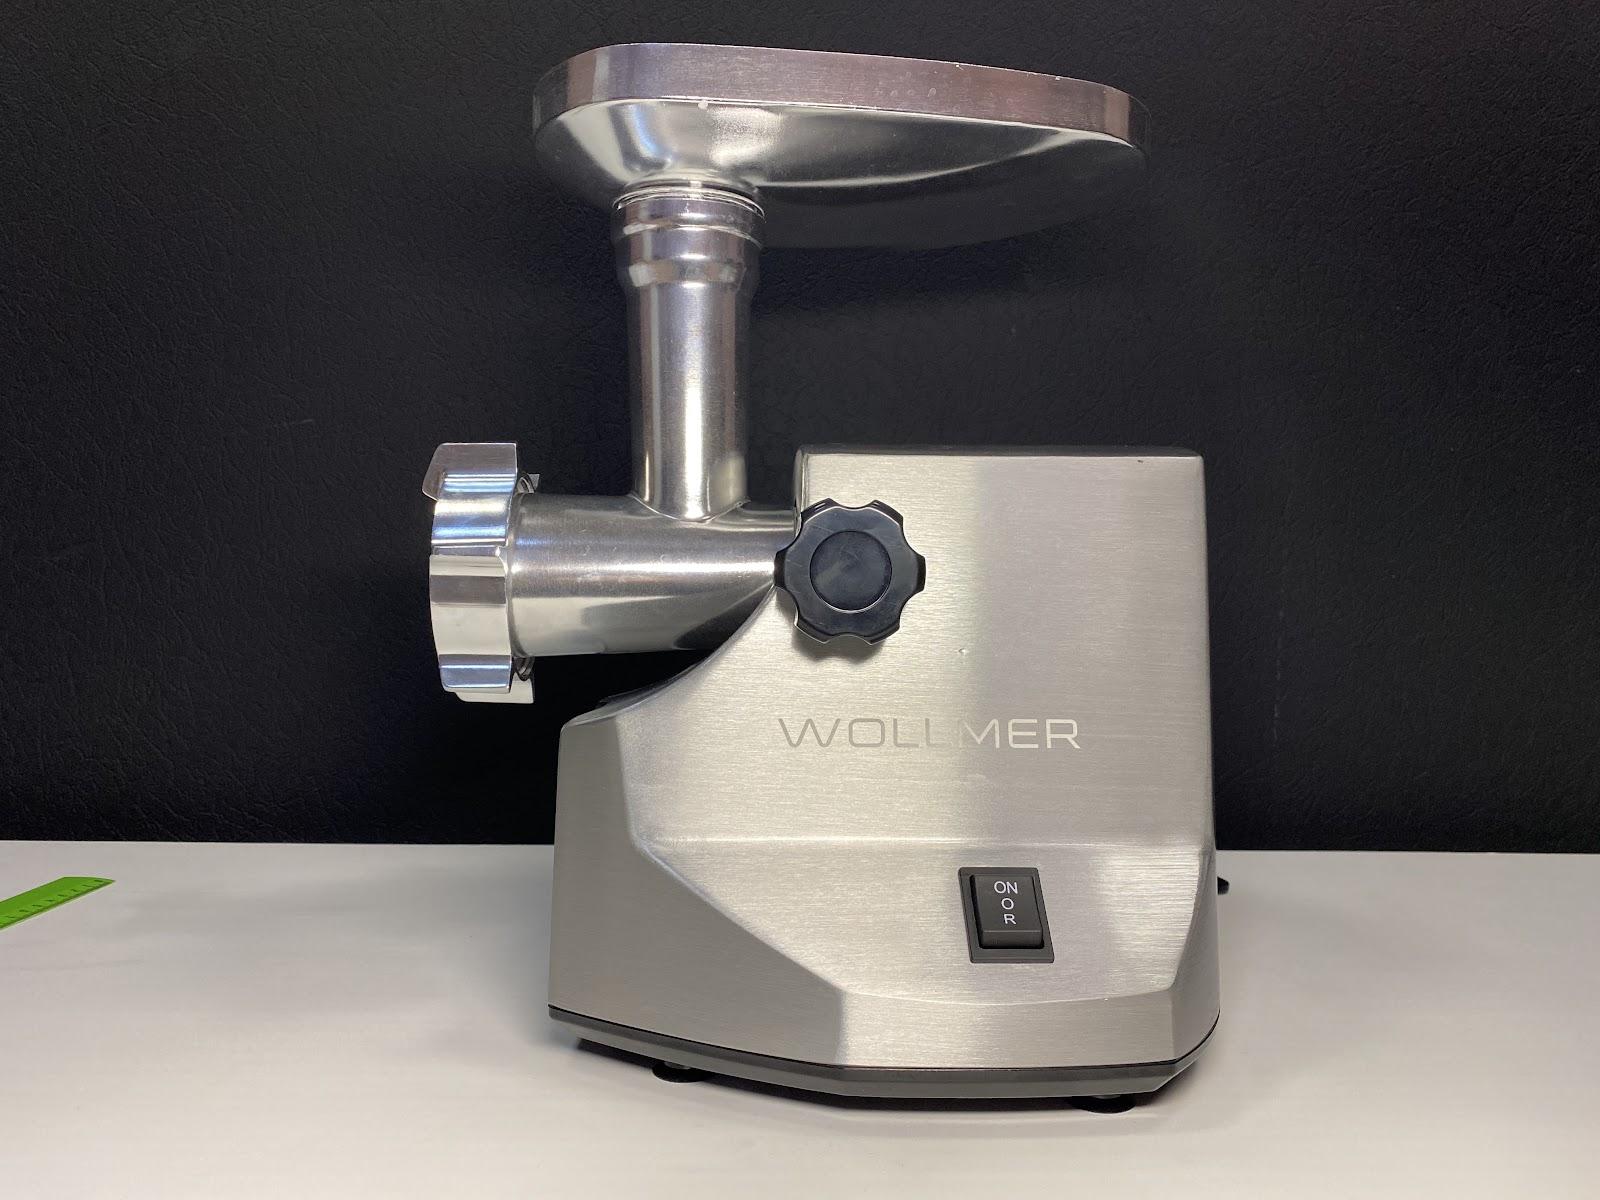 Мясорубка  Wollmer M901 в собранном виде